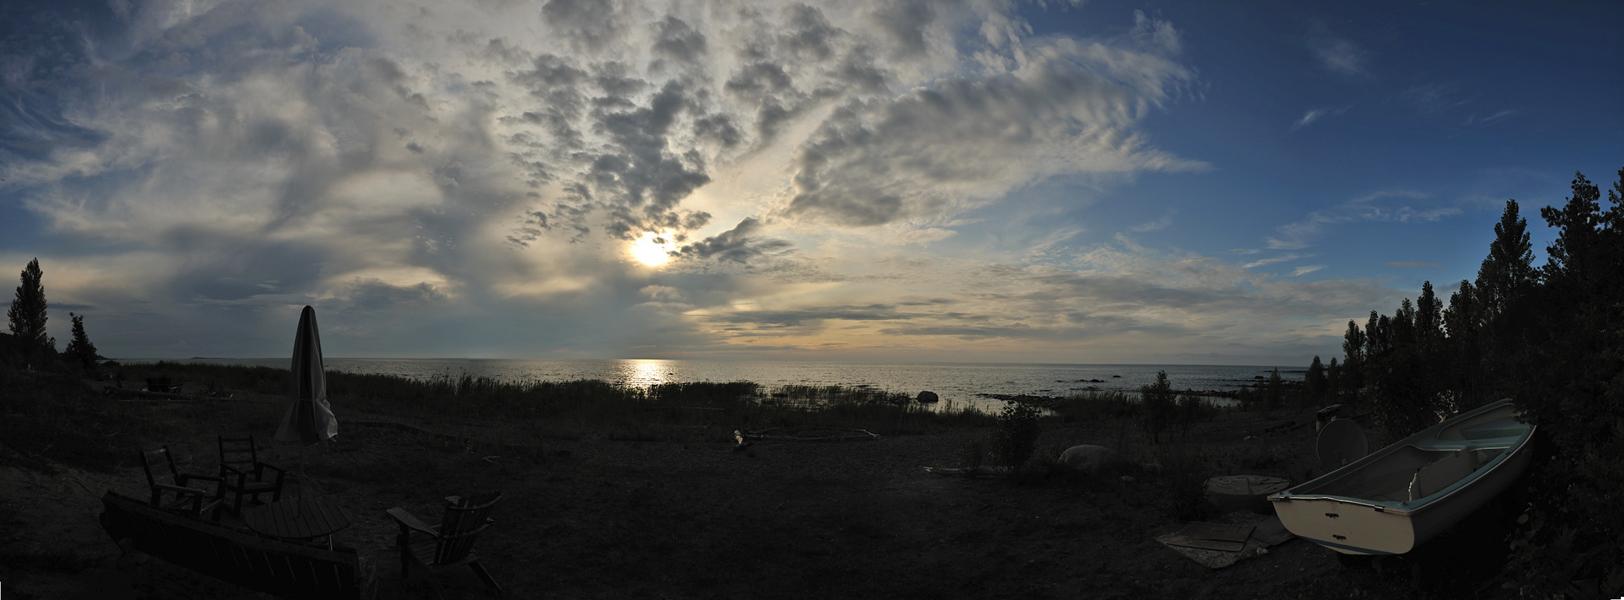 Lake Huron Pano 1